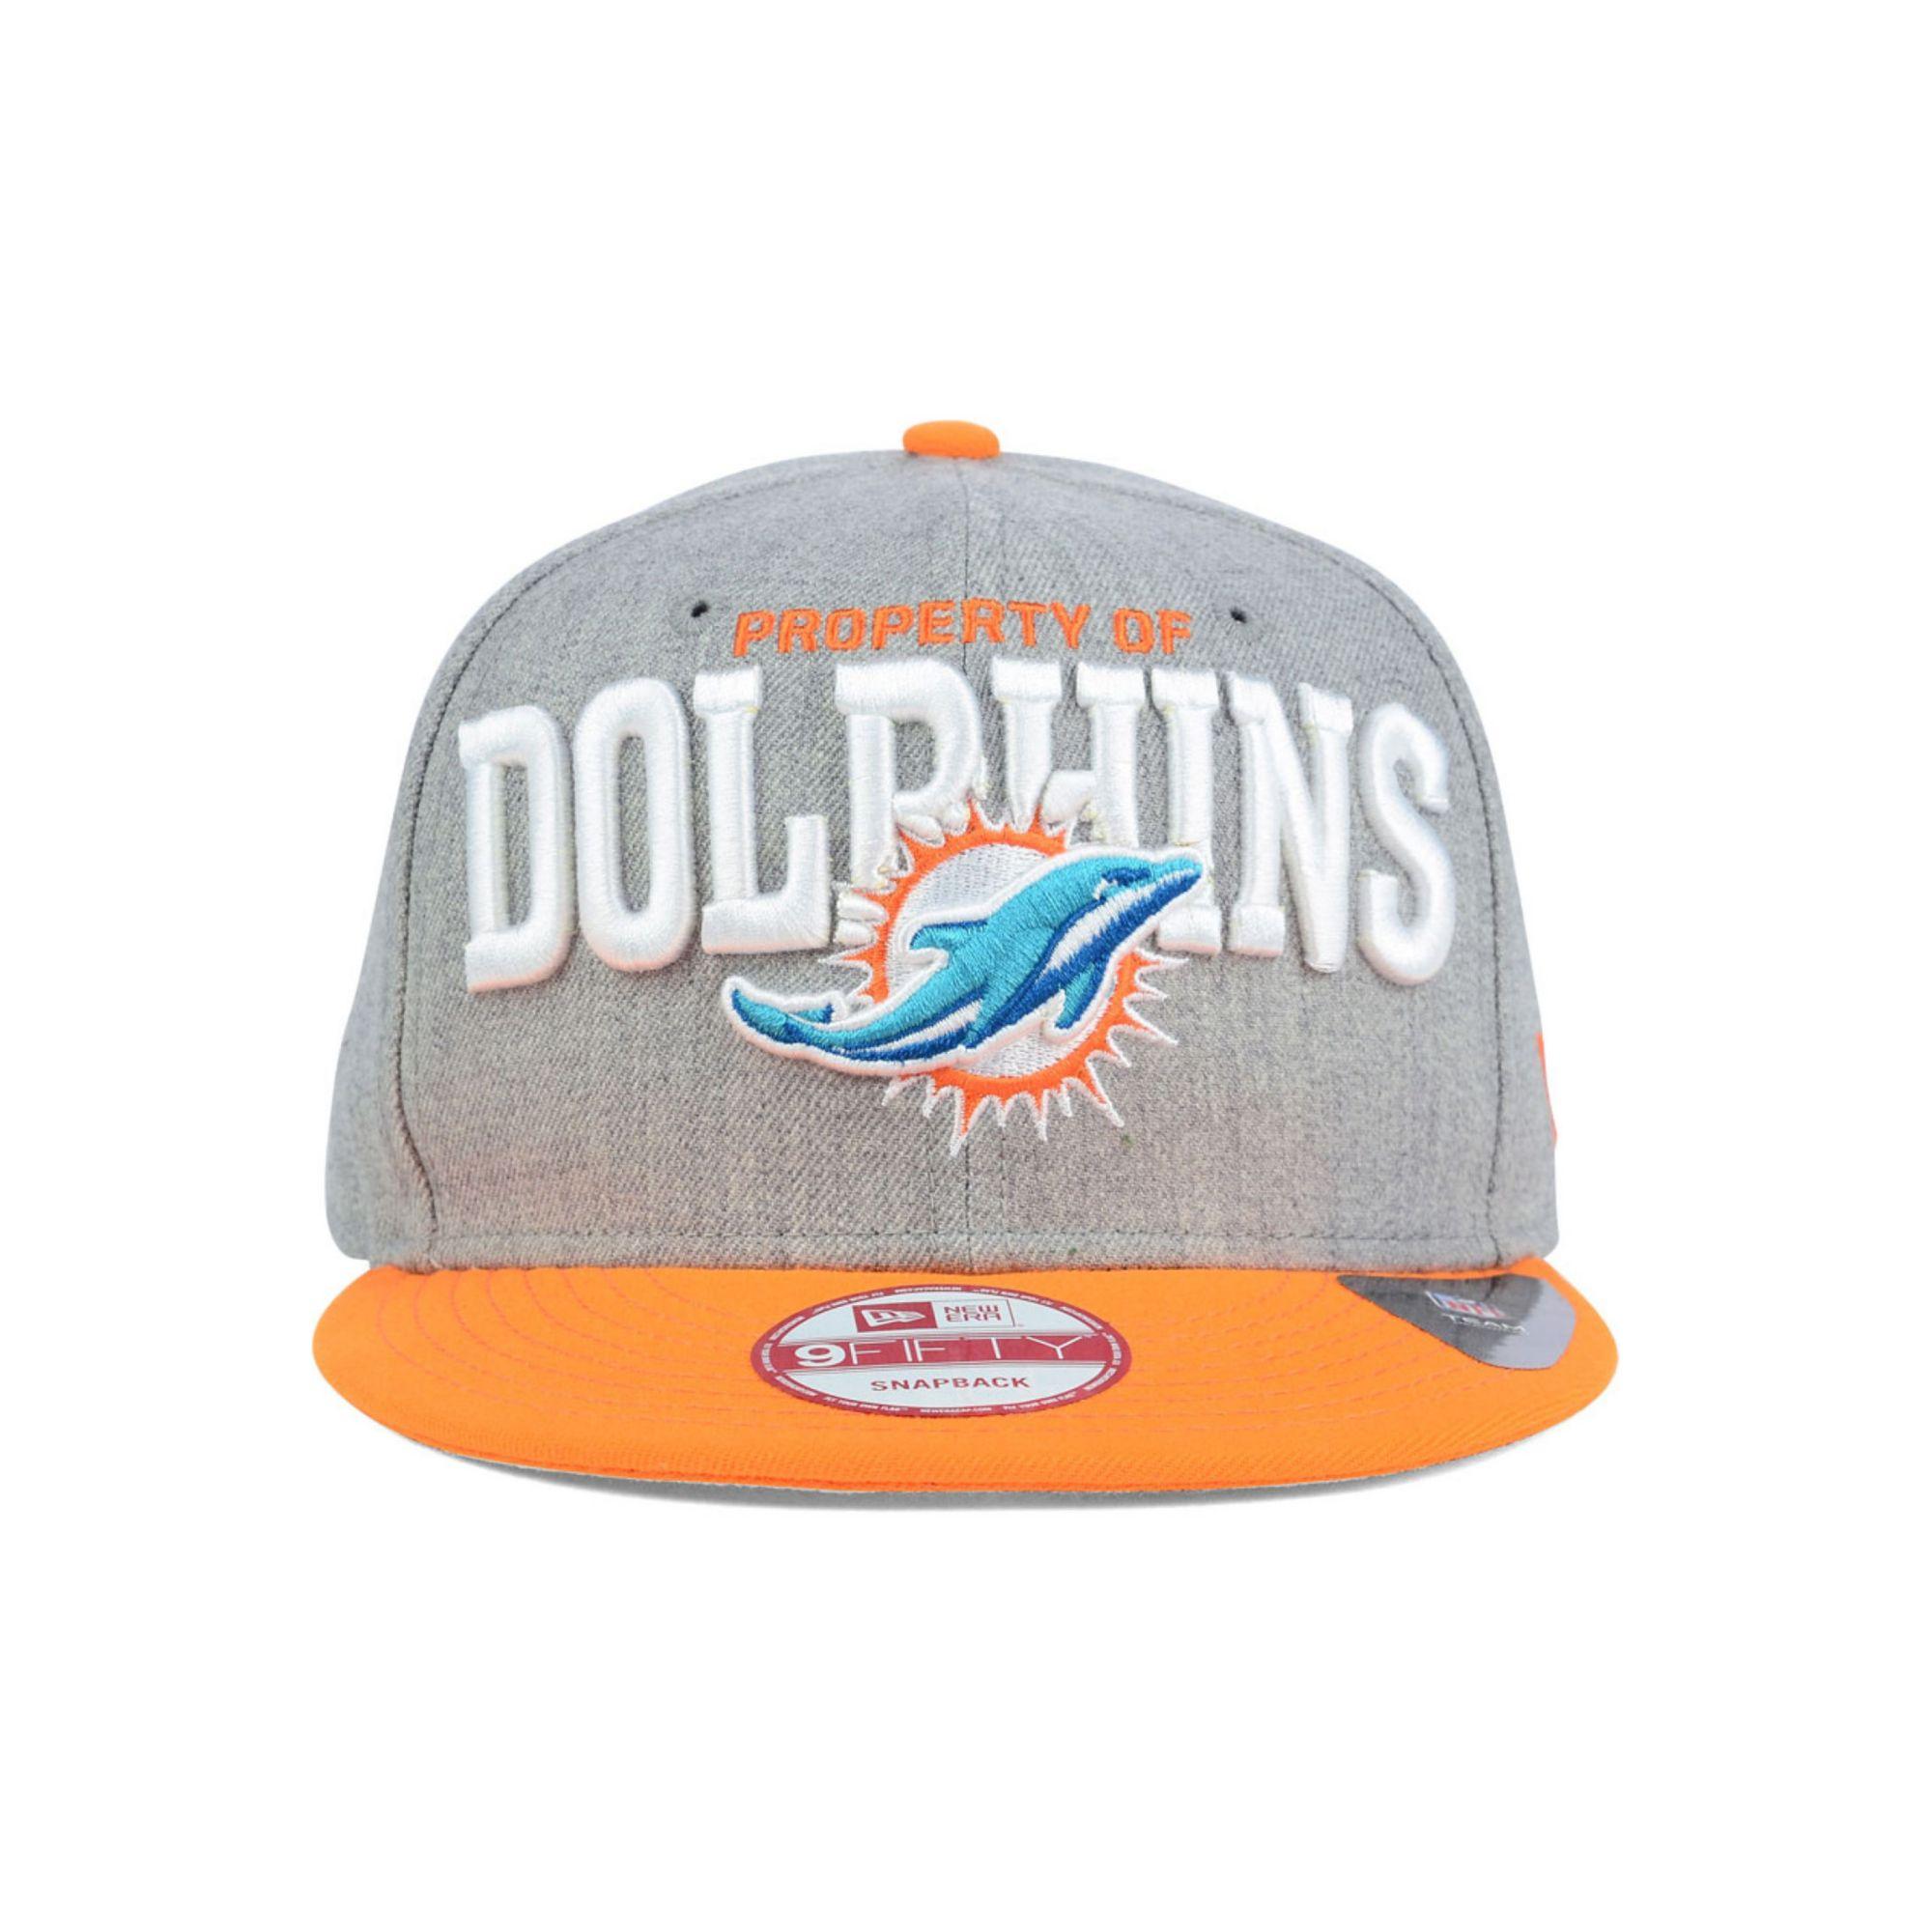 Men's Miami Dolphins New Era Orange Flip Up Team Redux 9FIFTY Snapback Adjustable Hat